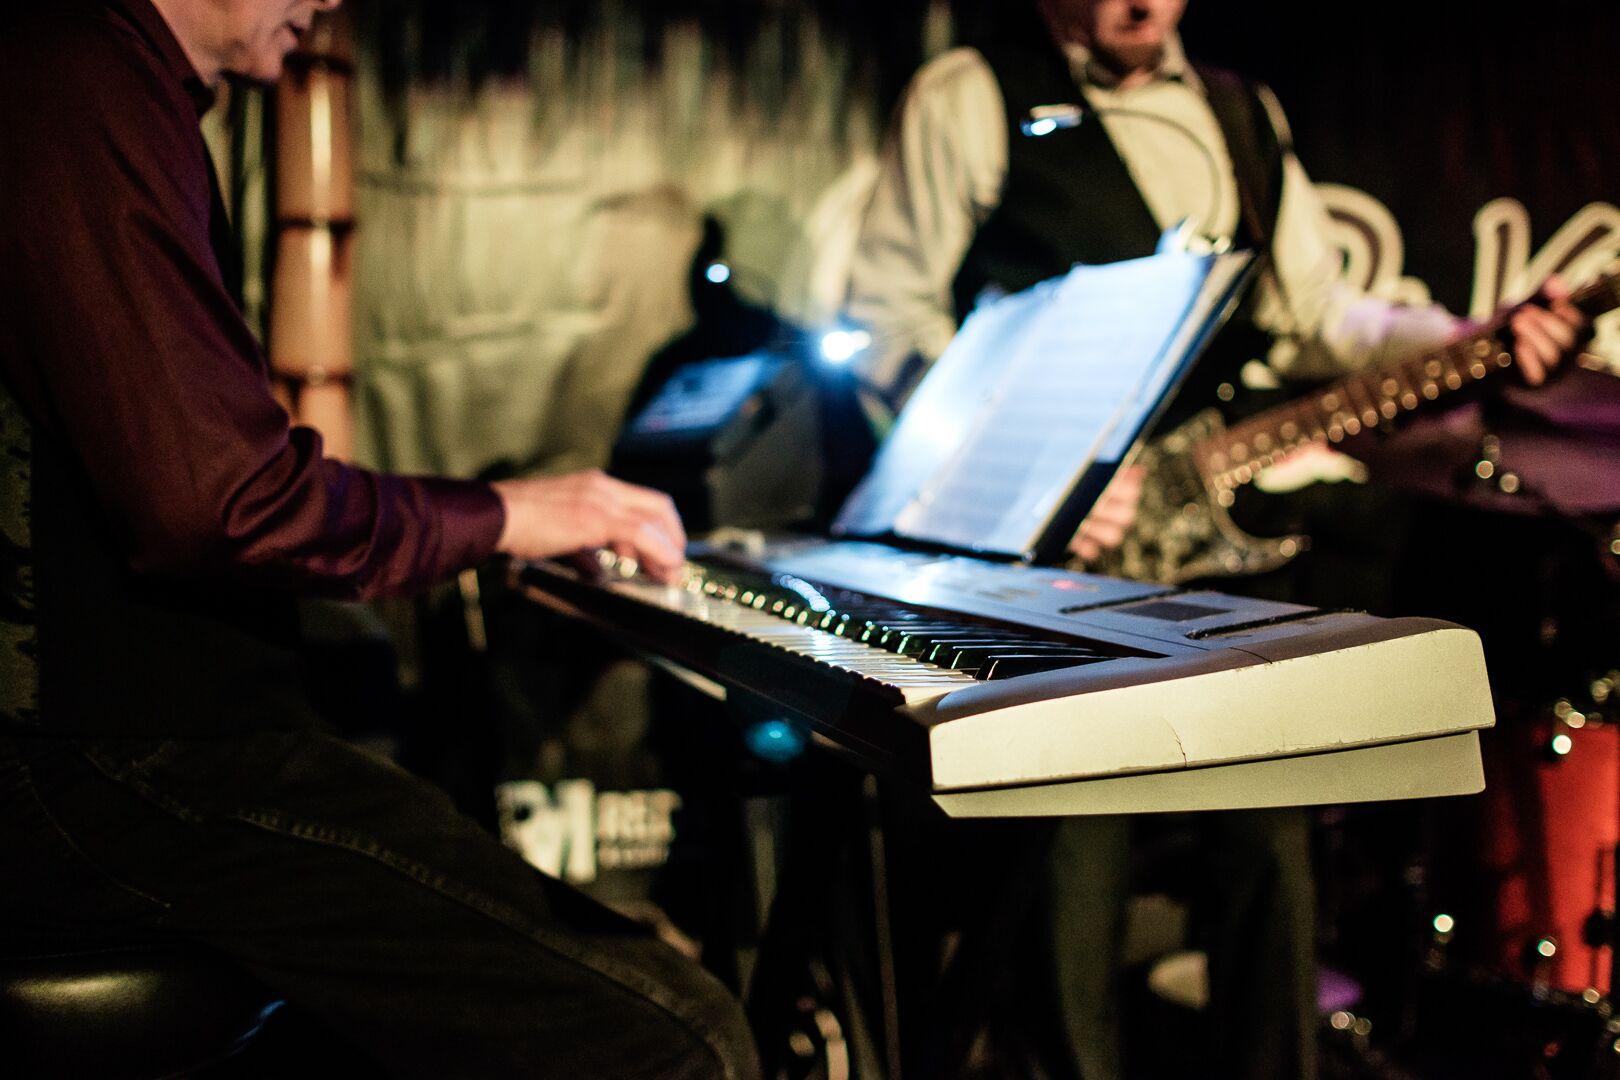 de-kine-grill-live-performance-11.jpg